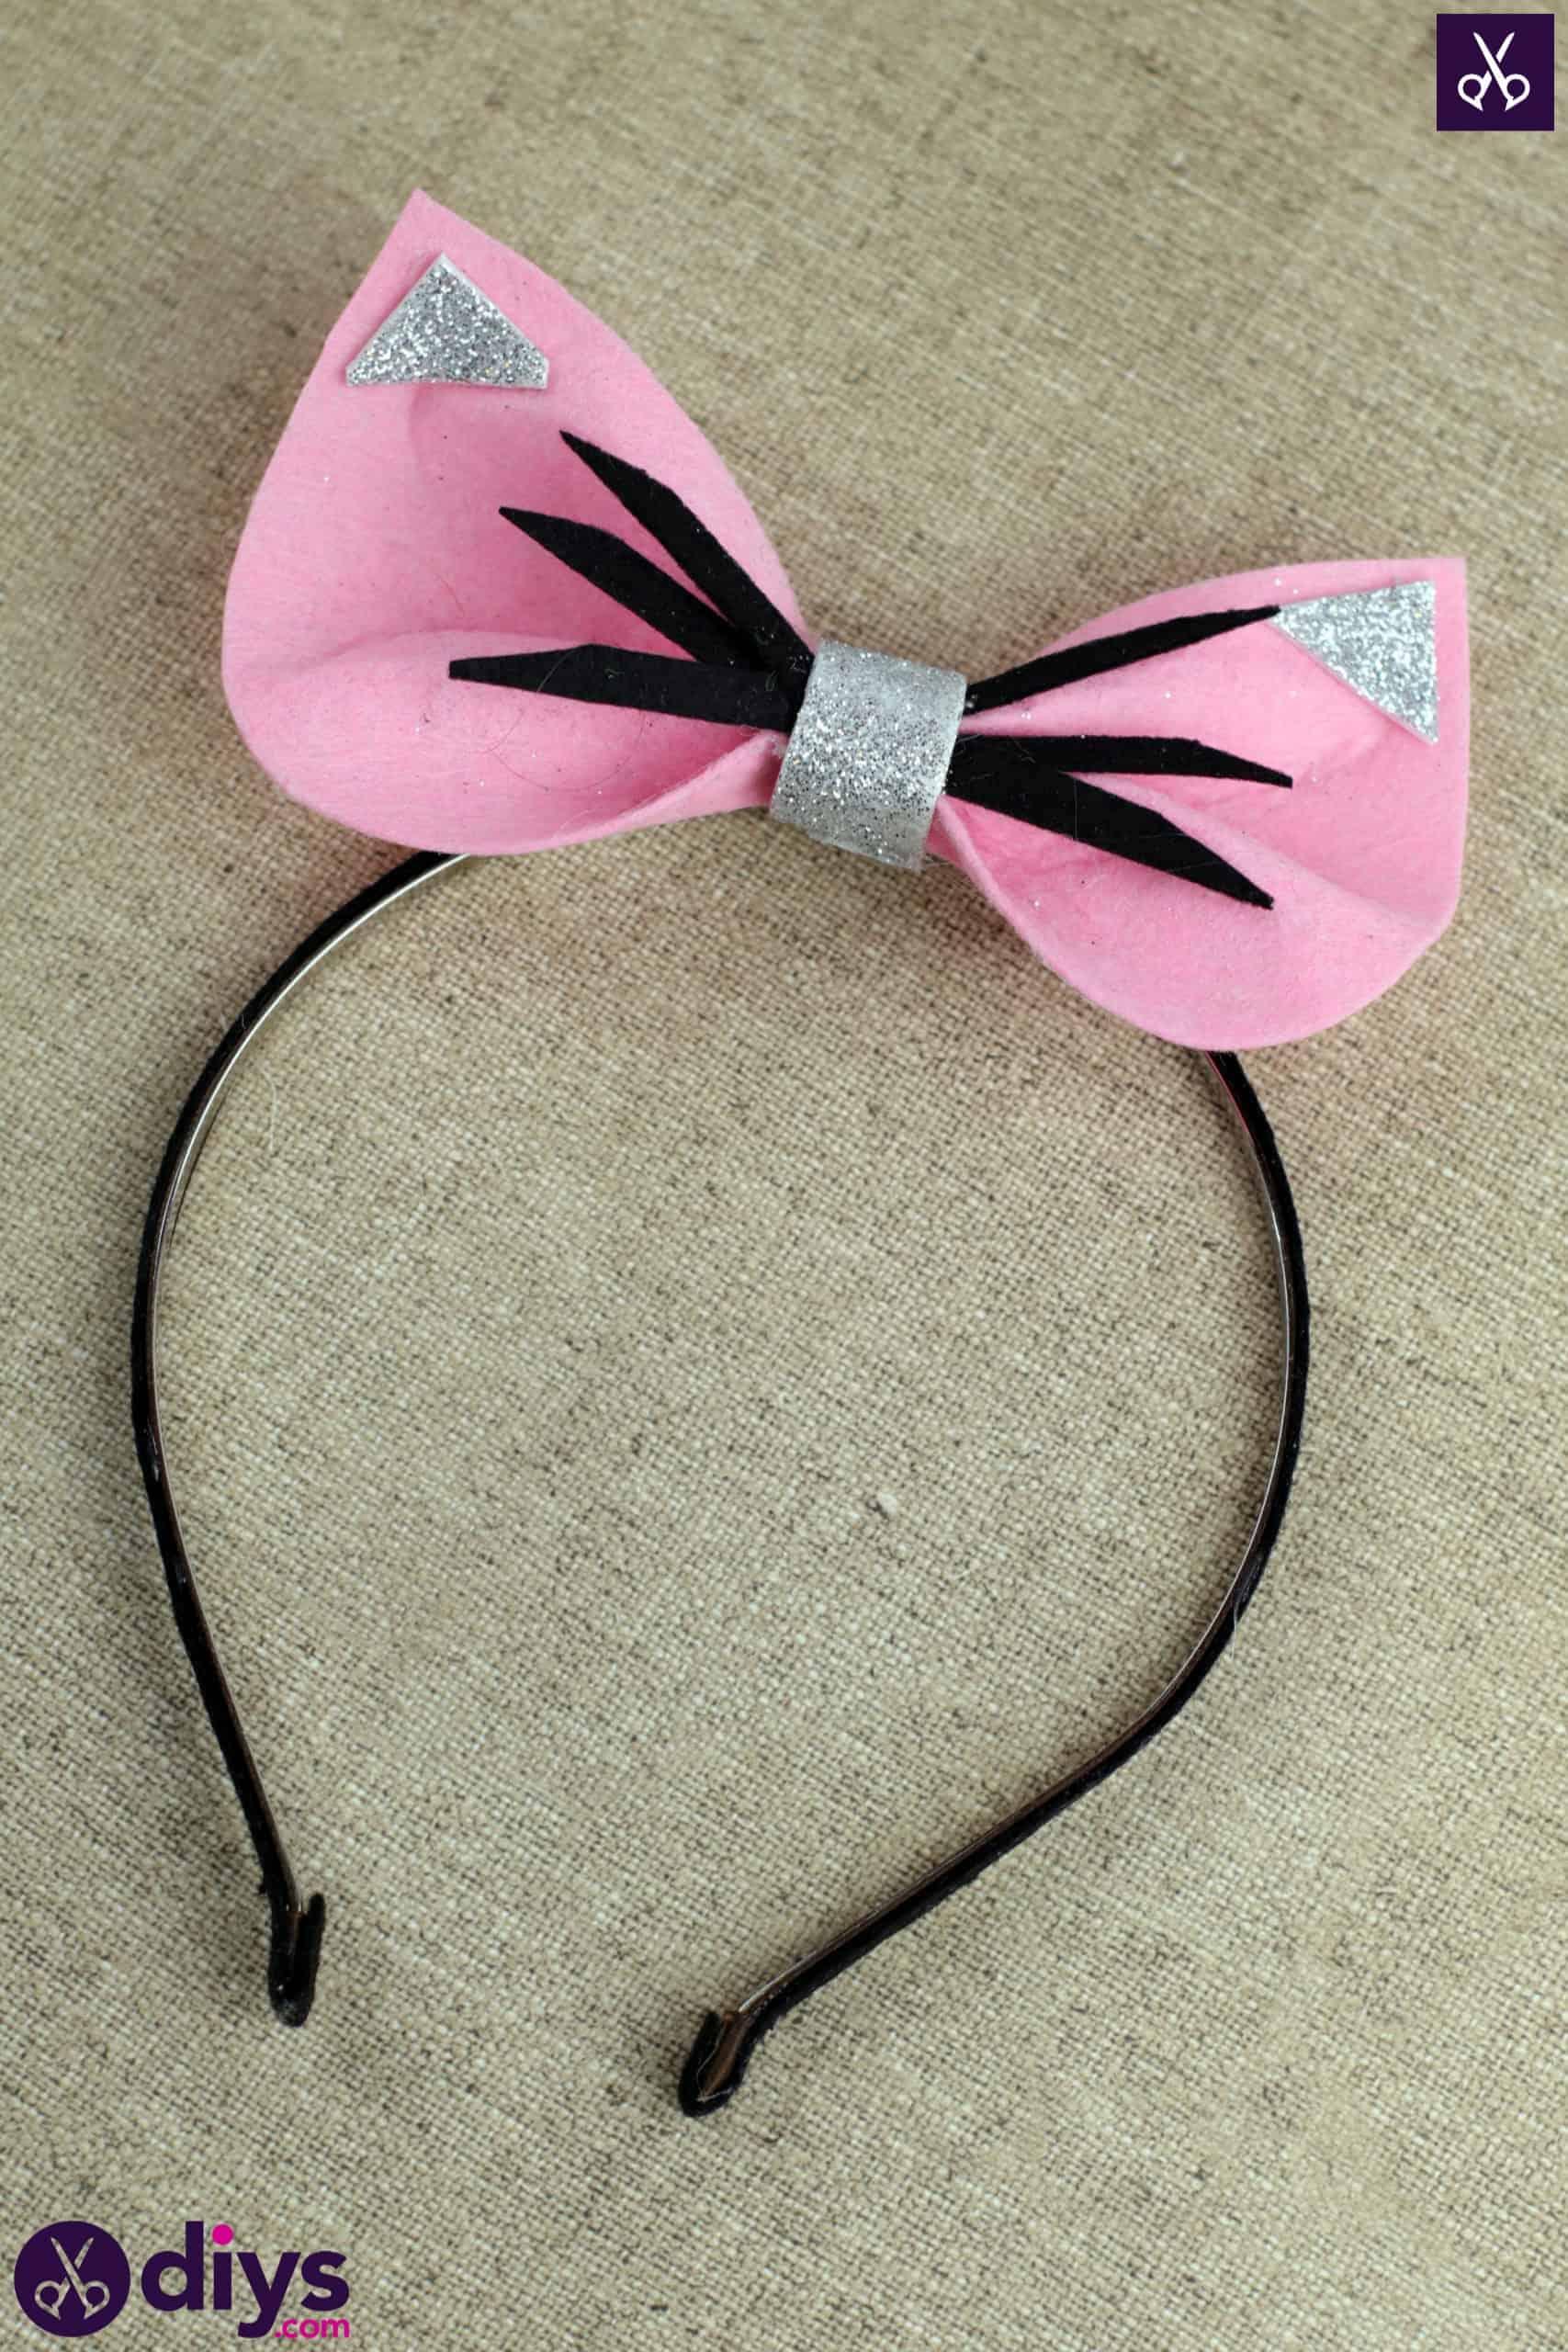 Diy cat ears headband